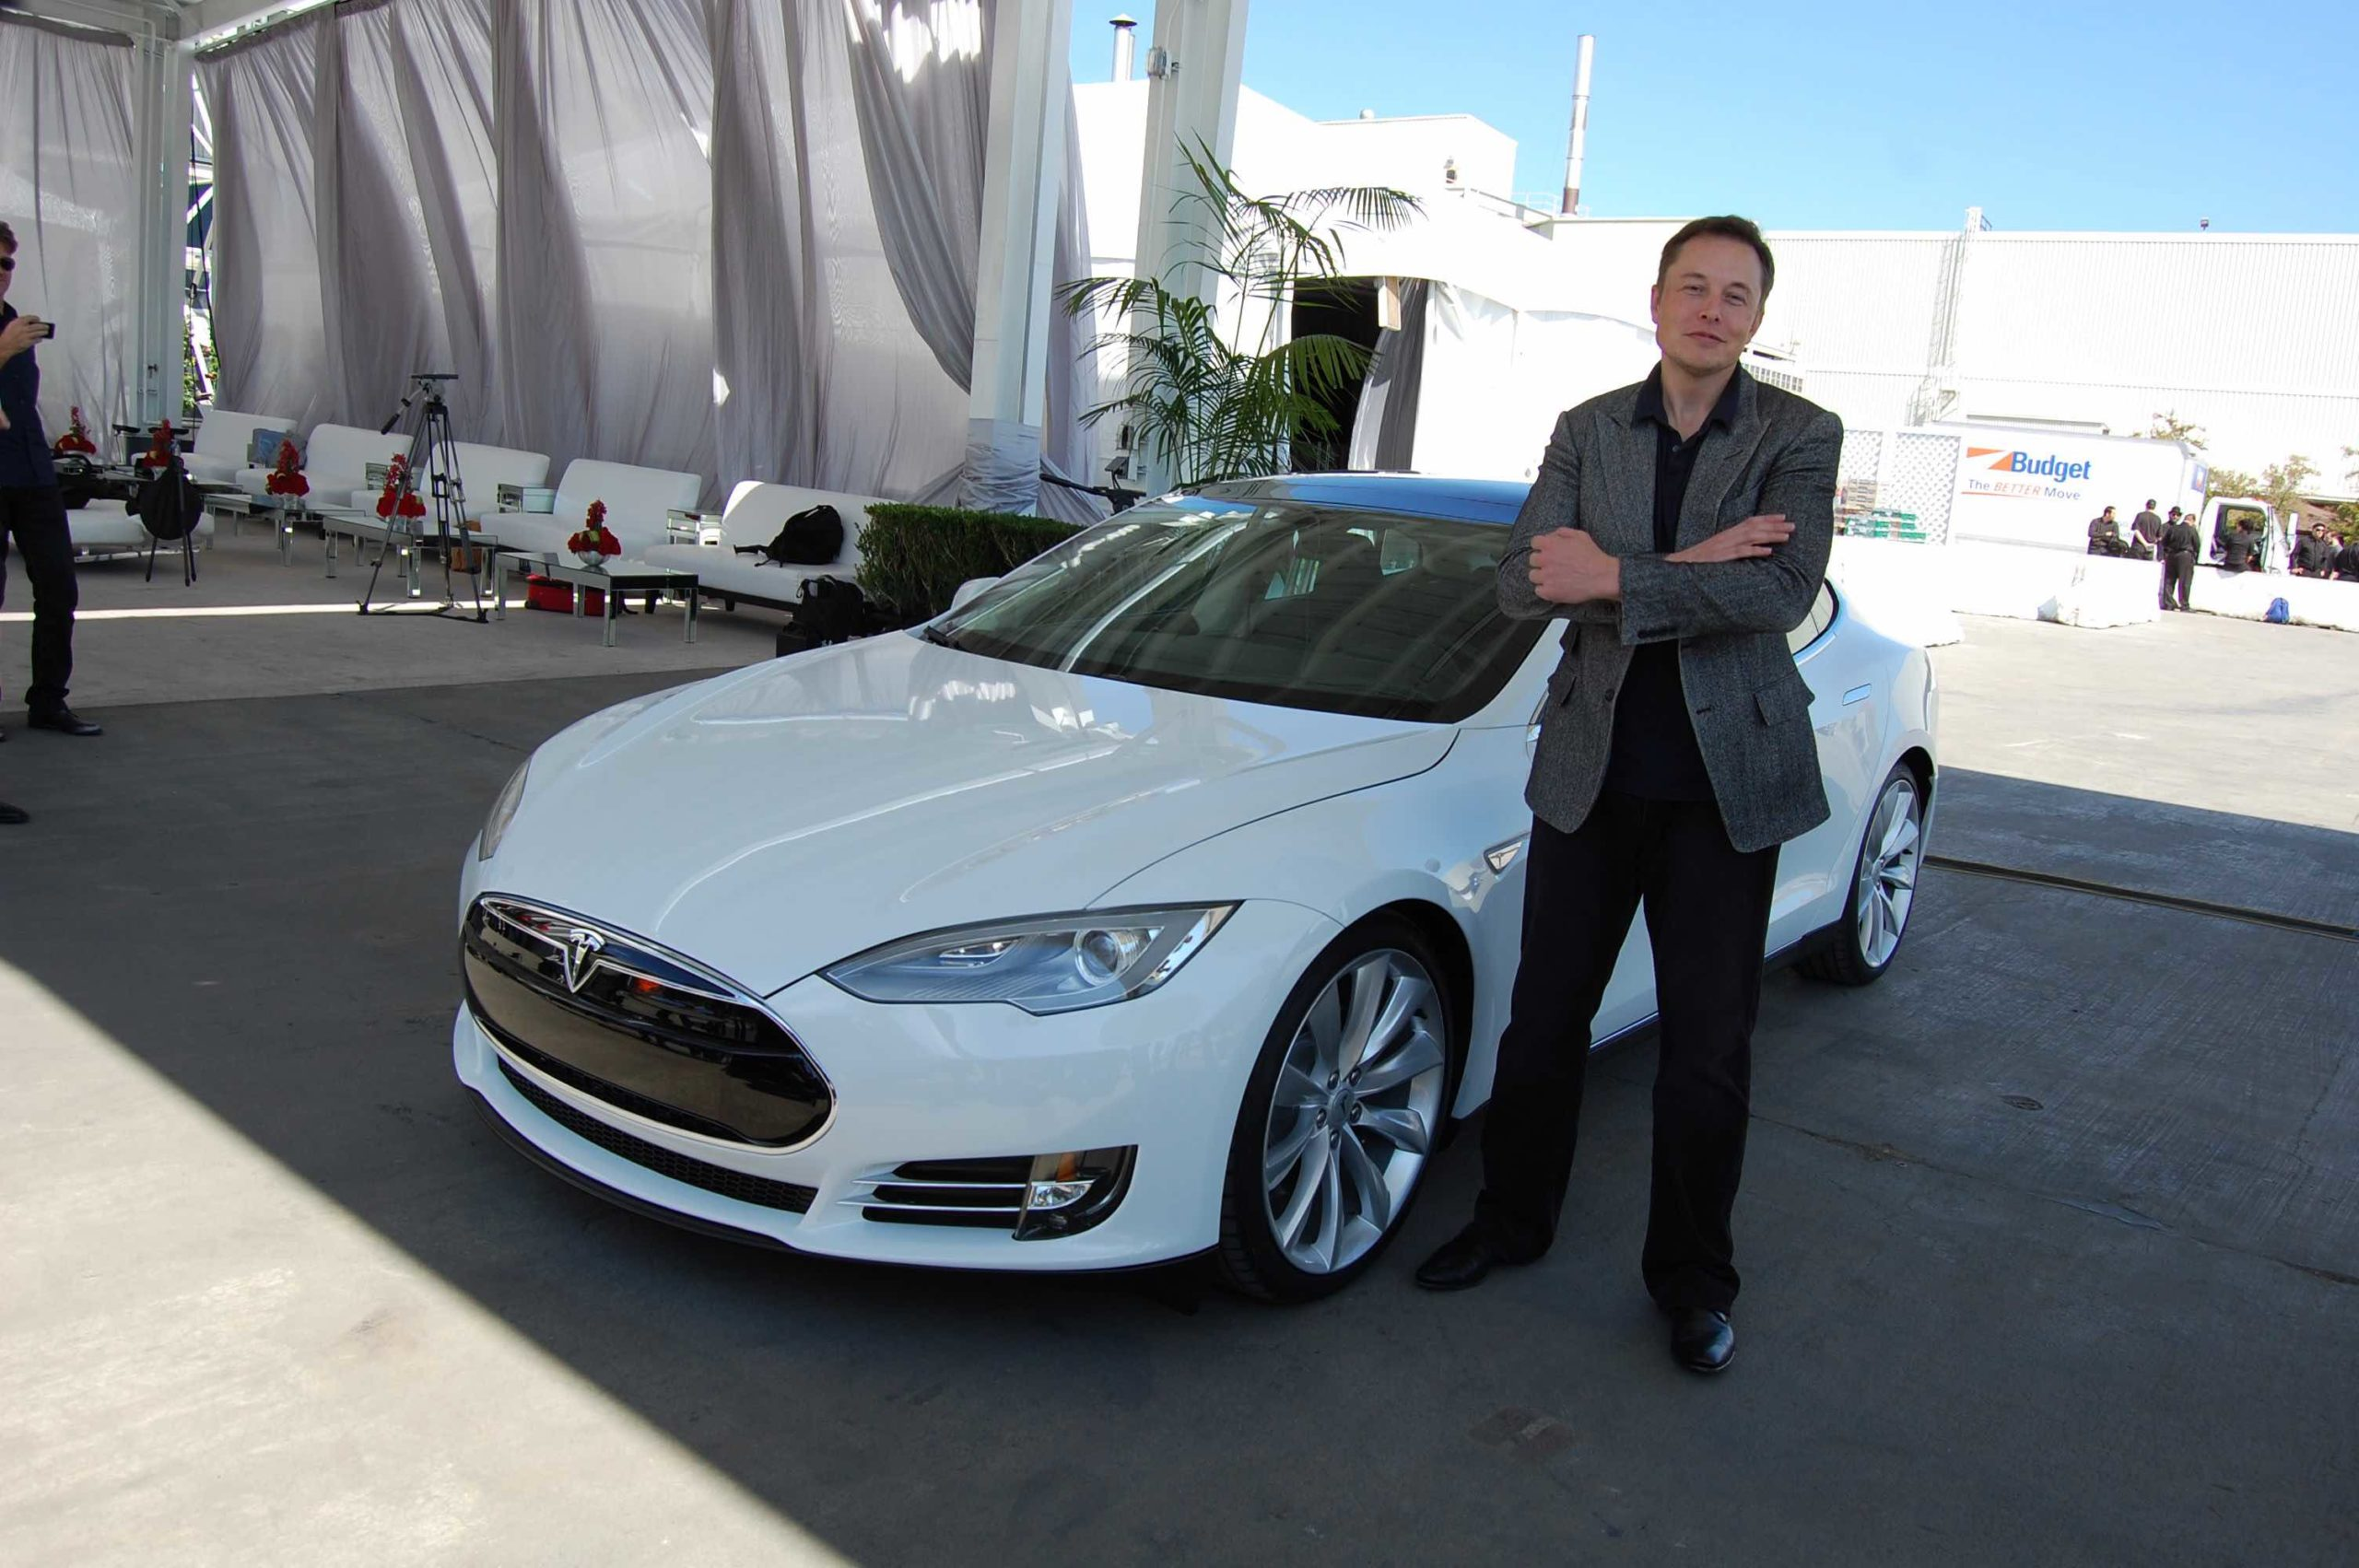 Tesla Battery day. Una nuova vettura elettrica in arrivo